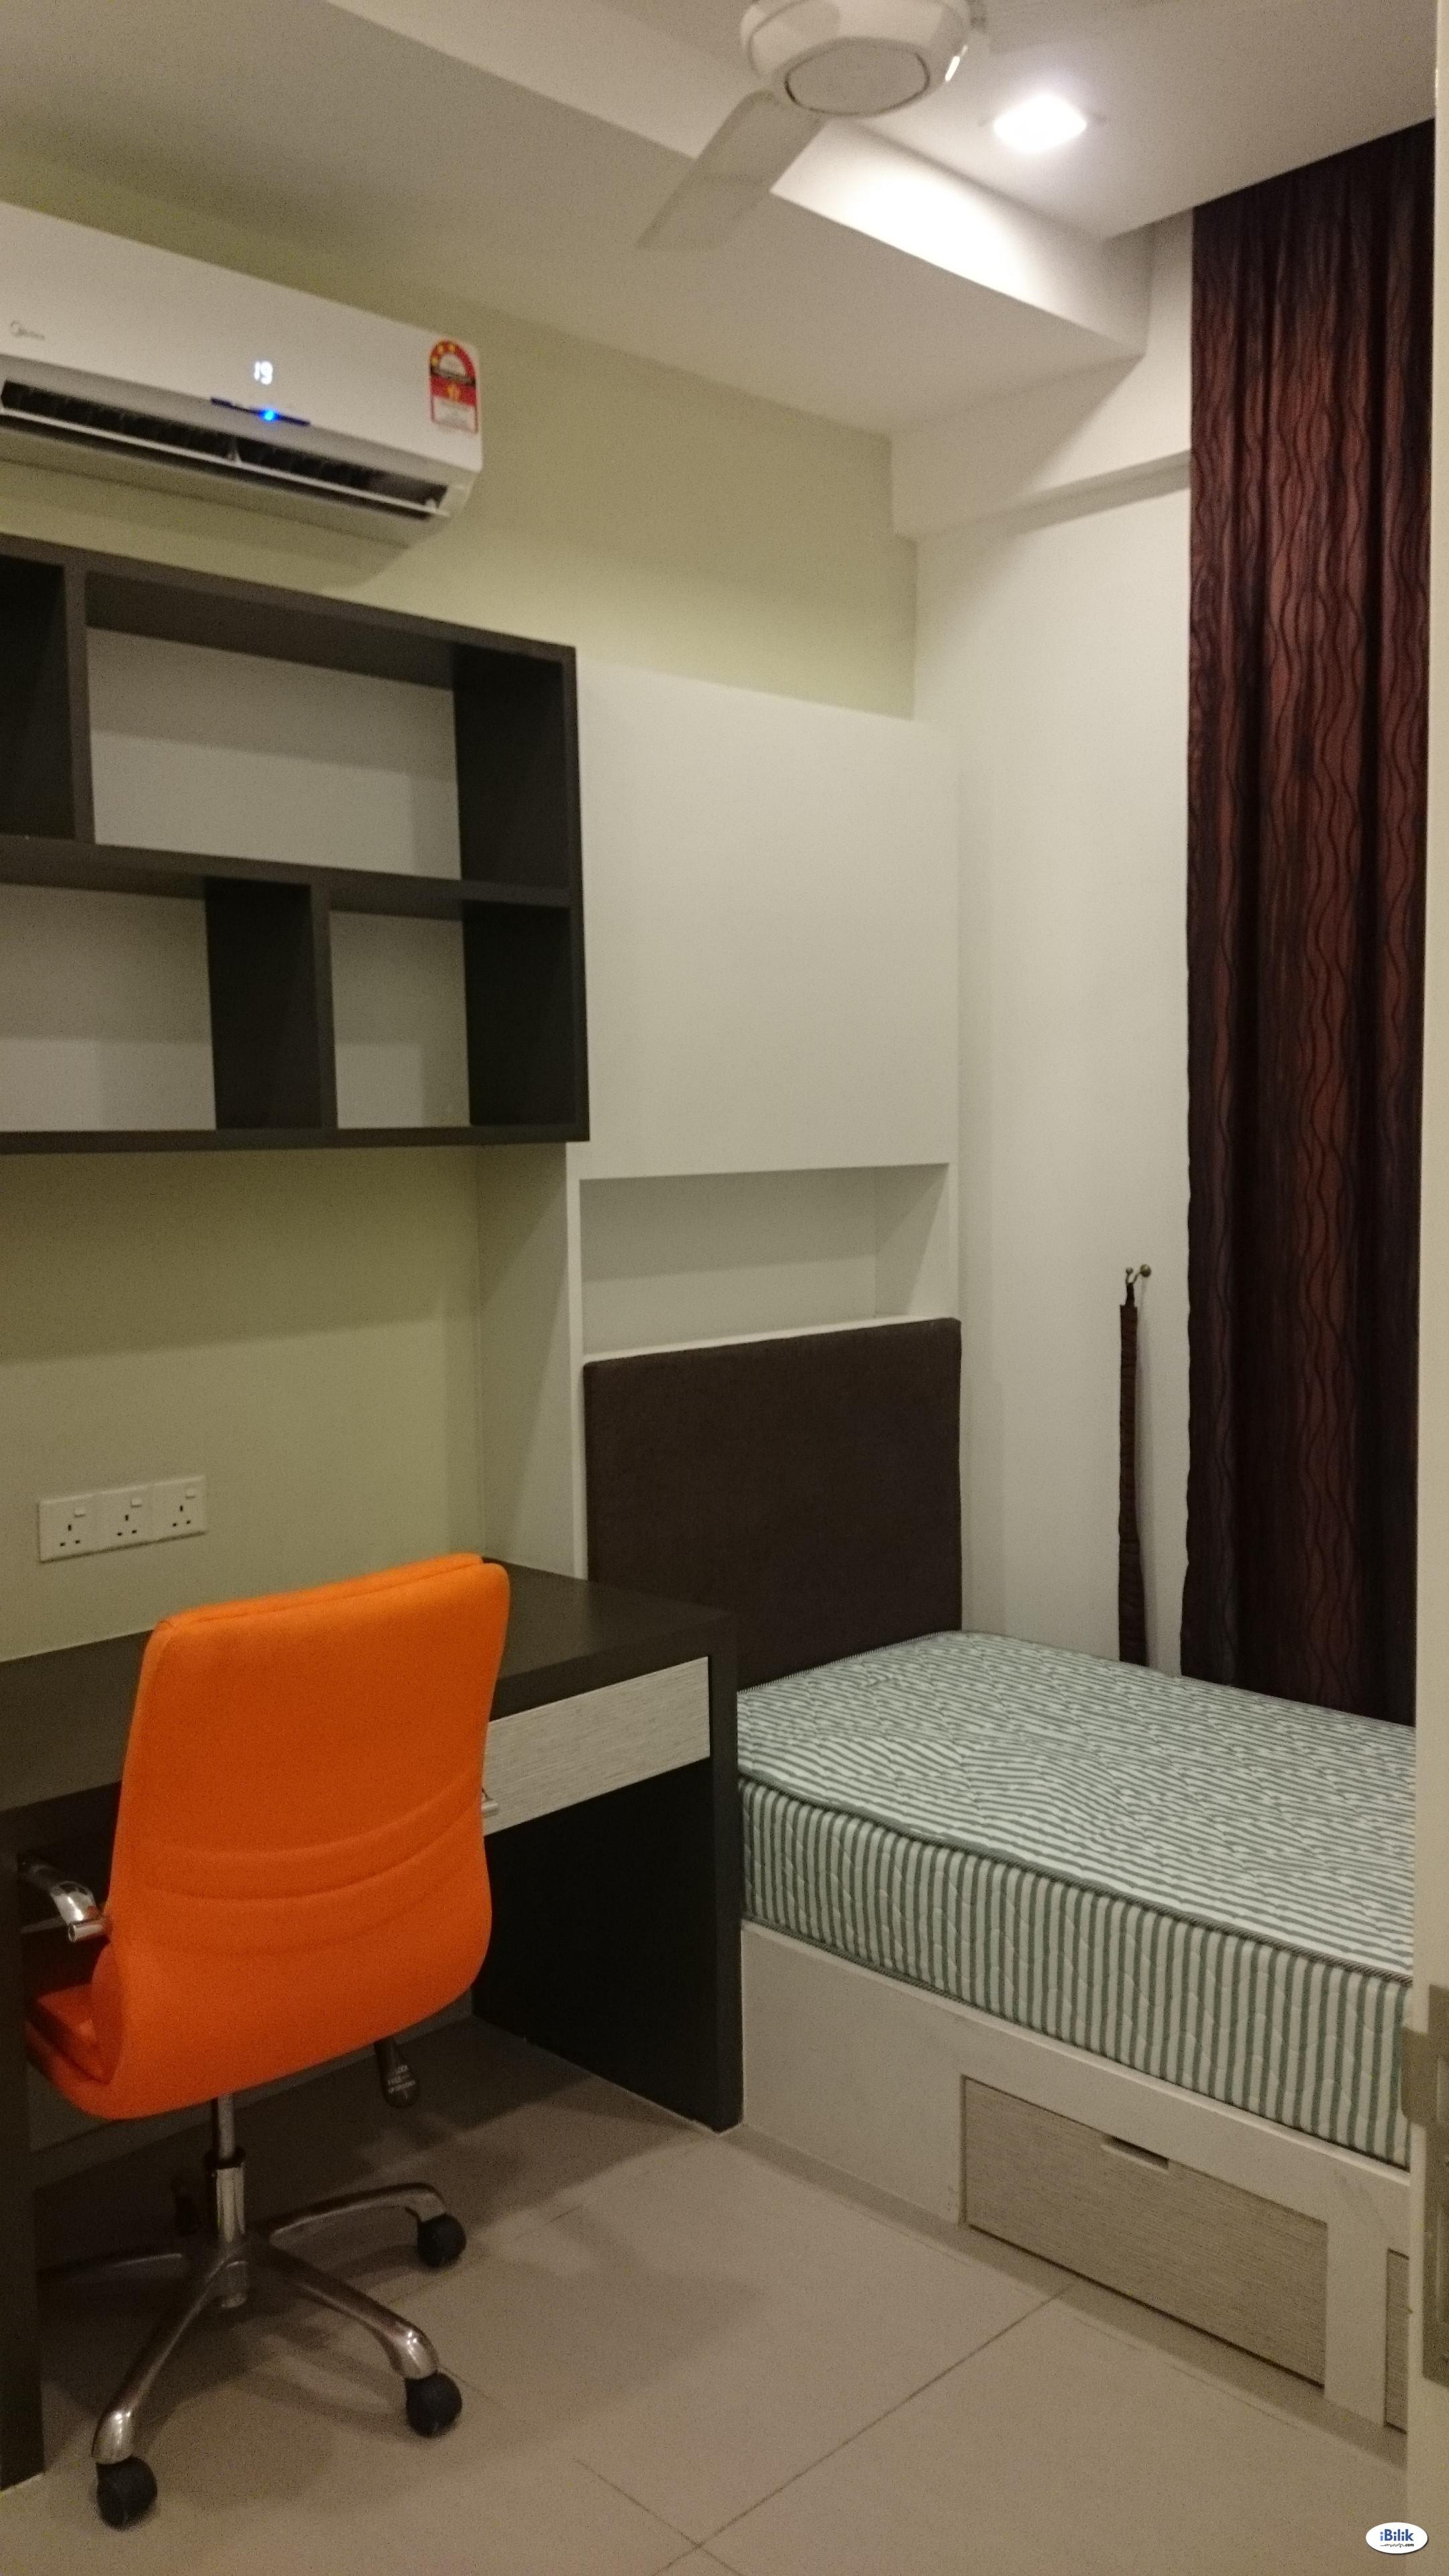 Room Fully Furnished at Garden Plaza Cyberjaya Lim Kok Wing